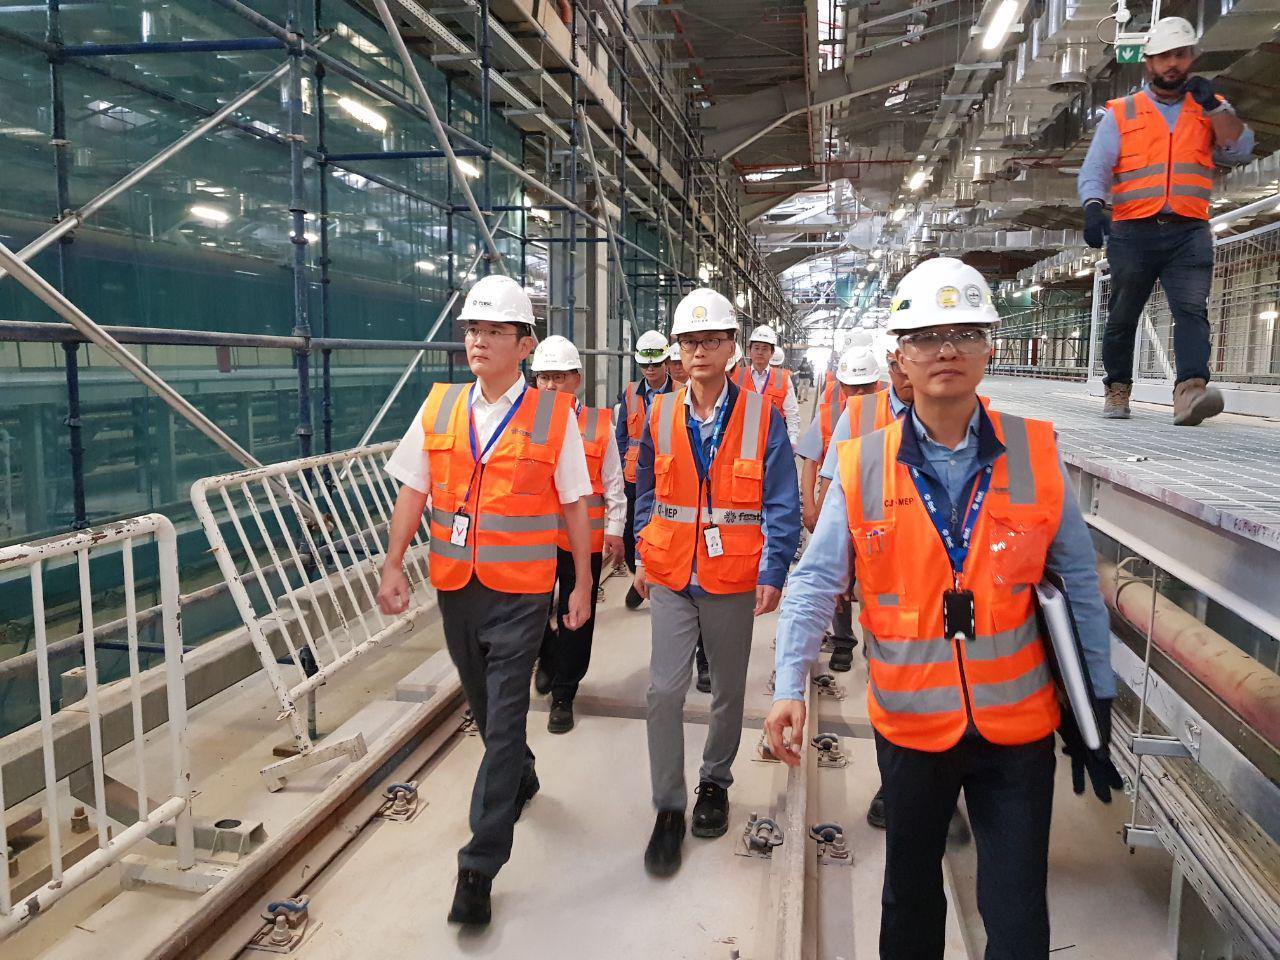 Samsung heir Lee Jae-yong walks through a construction site of a subway line by Samsung C&T in Riyadh, Saudi Arabia, on Sunday. (Samsung Electronics)